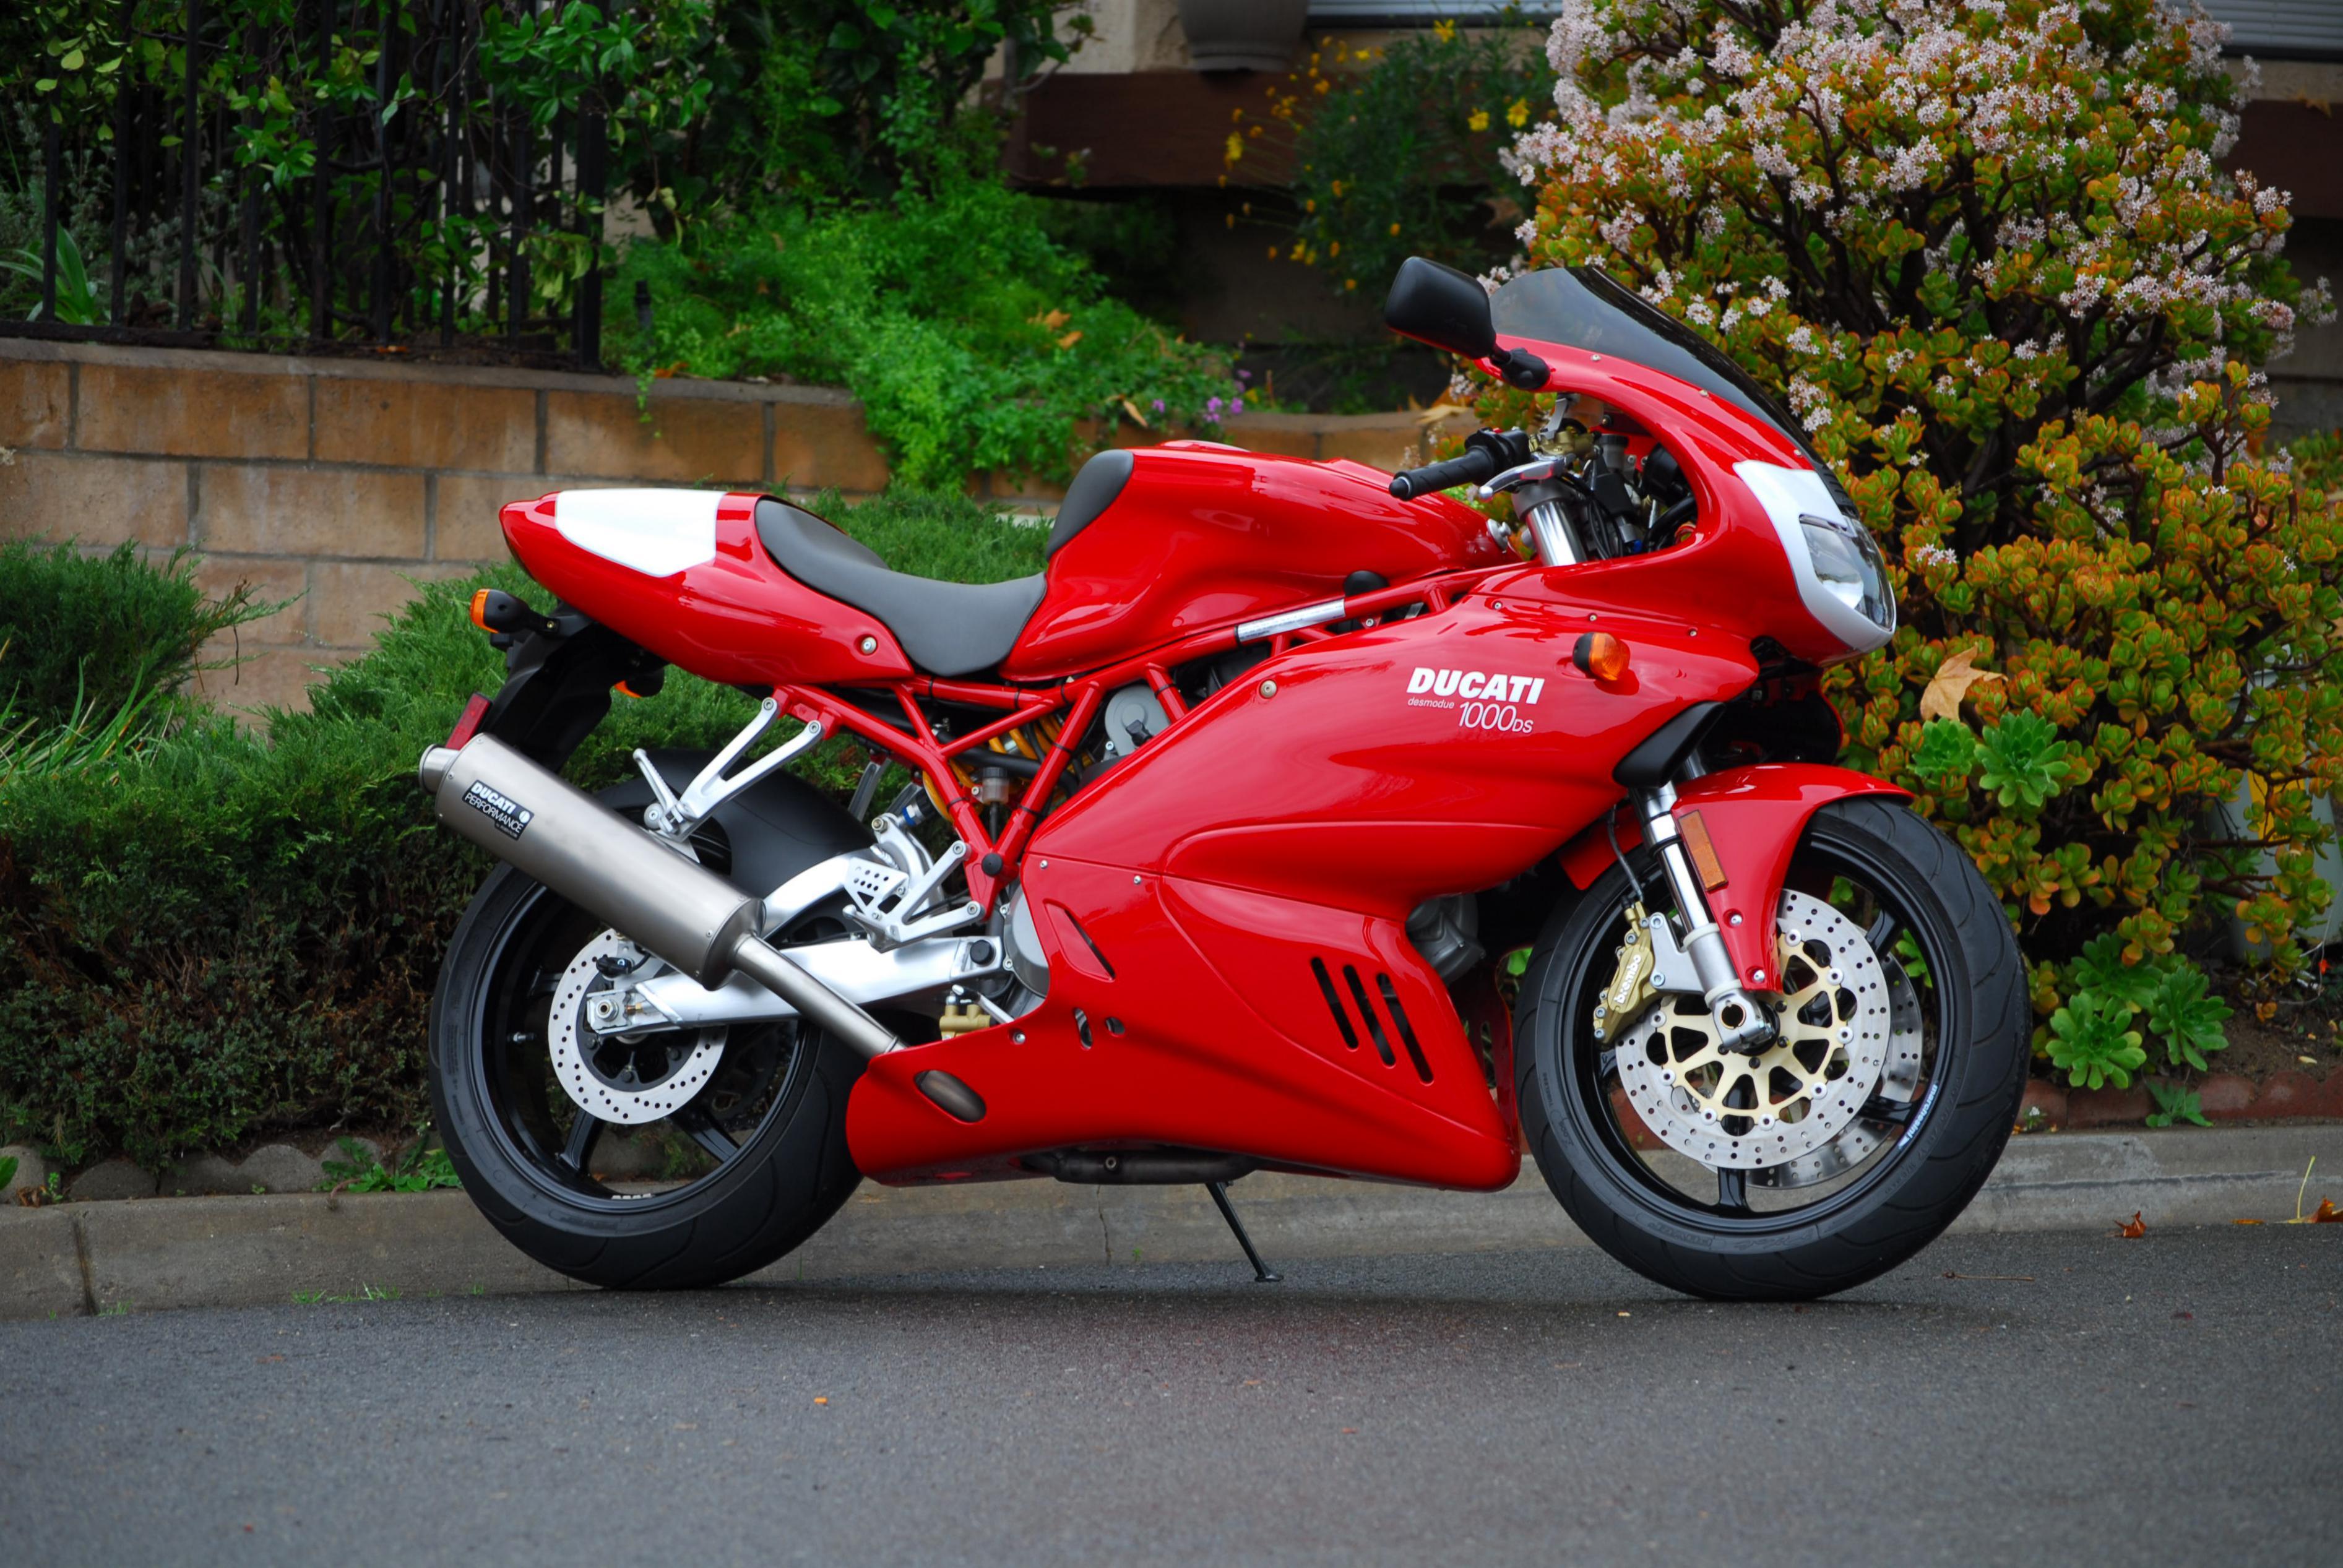 Ducati Monster Fairing Review